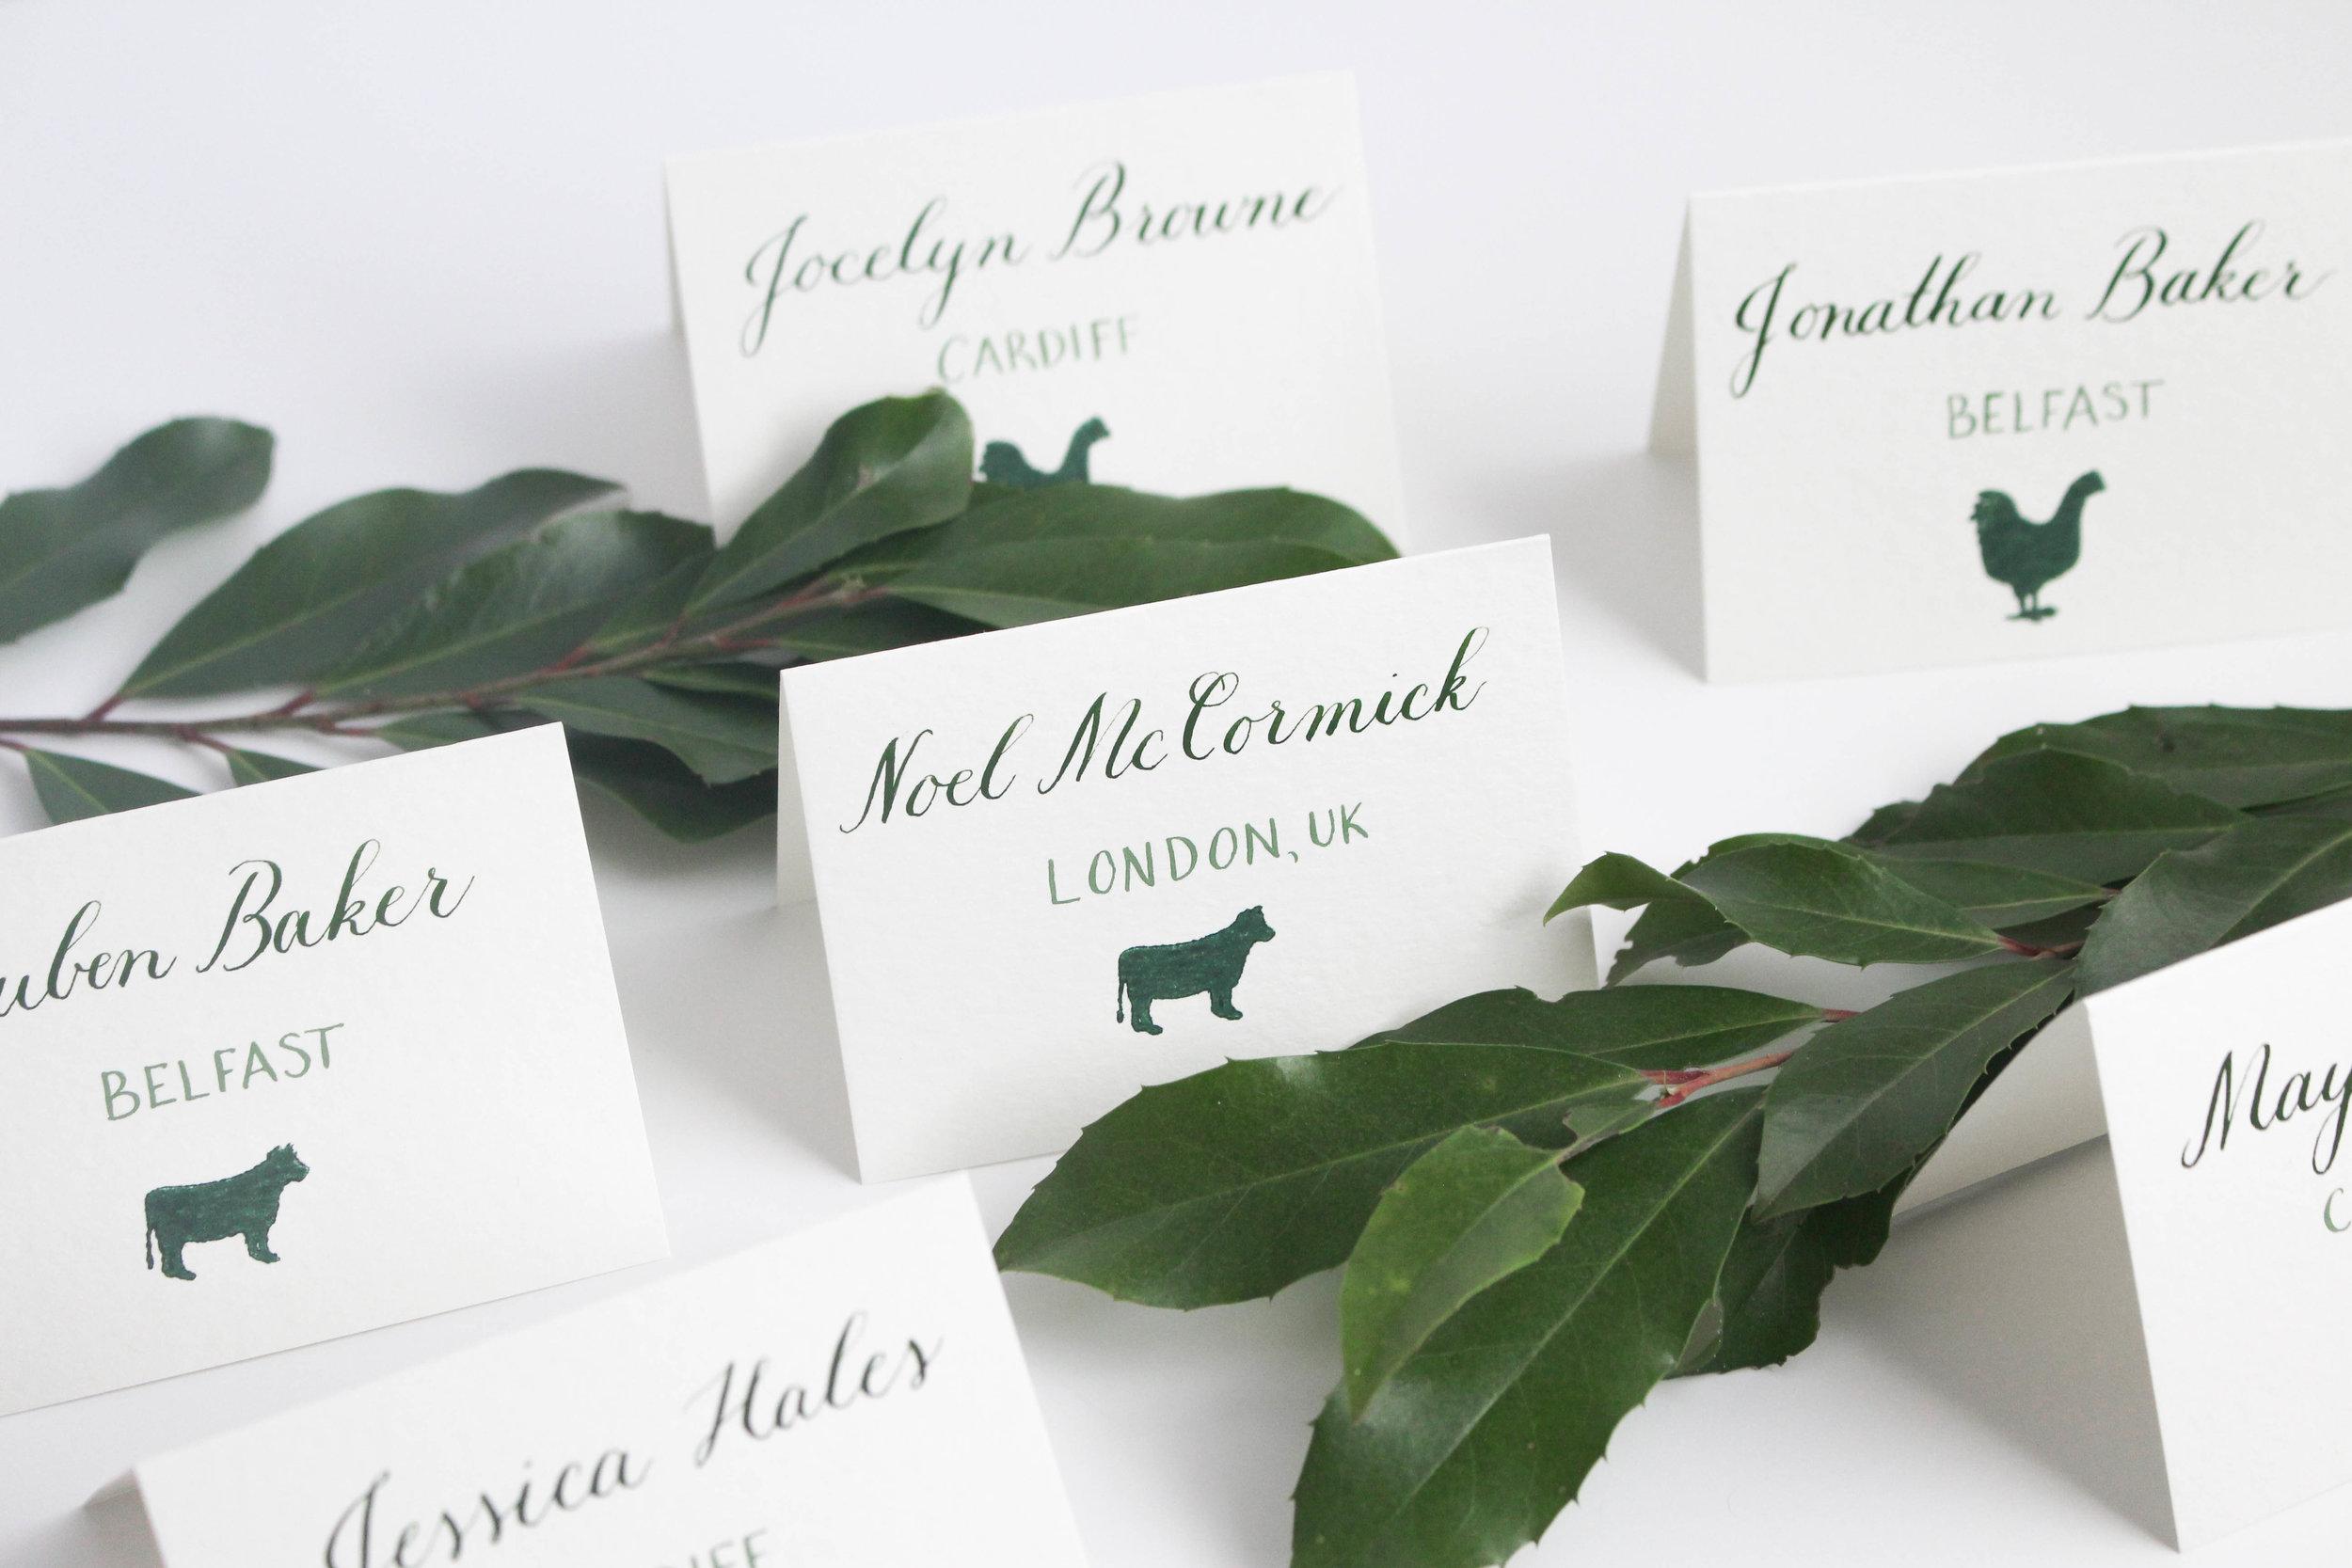 placecards-custom-wedding-details-modern-calligraphy-truenorthpaperco.jpg